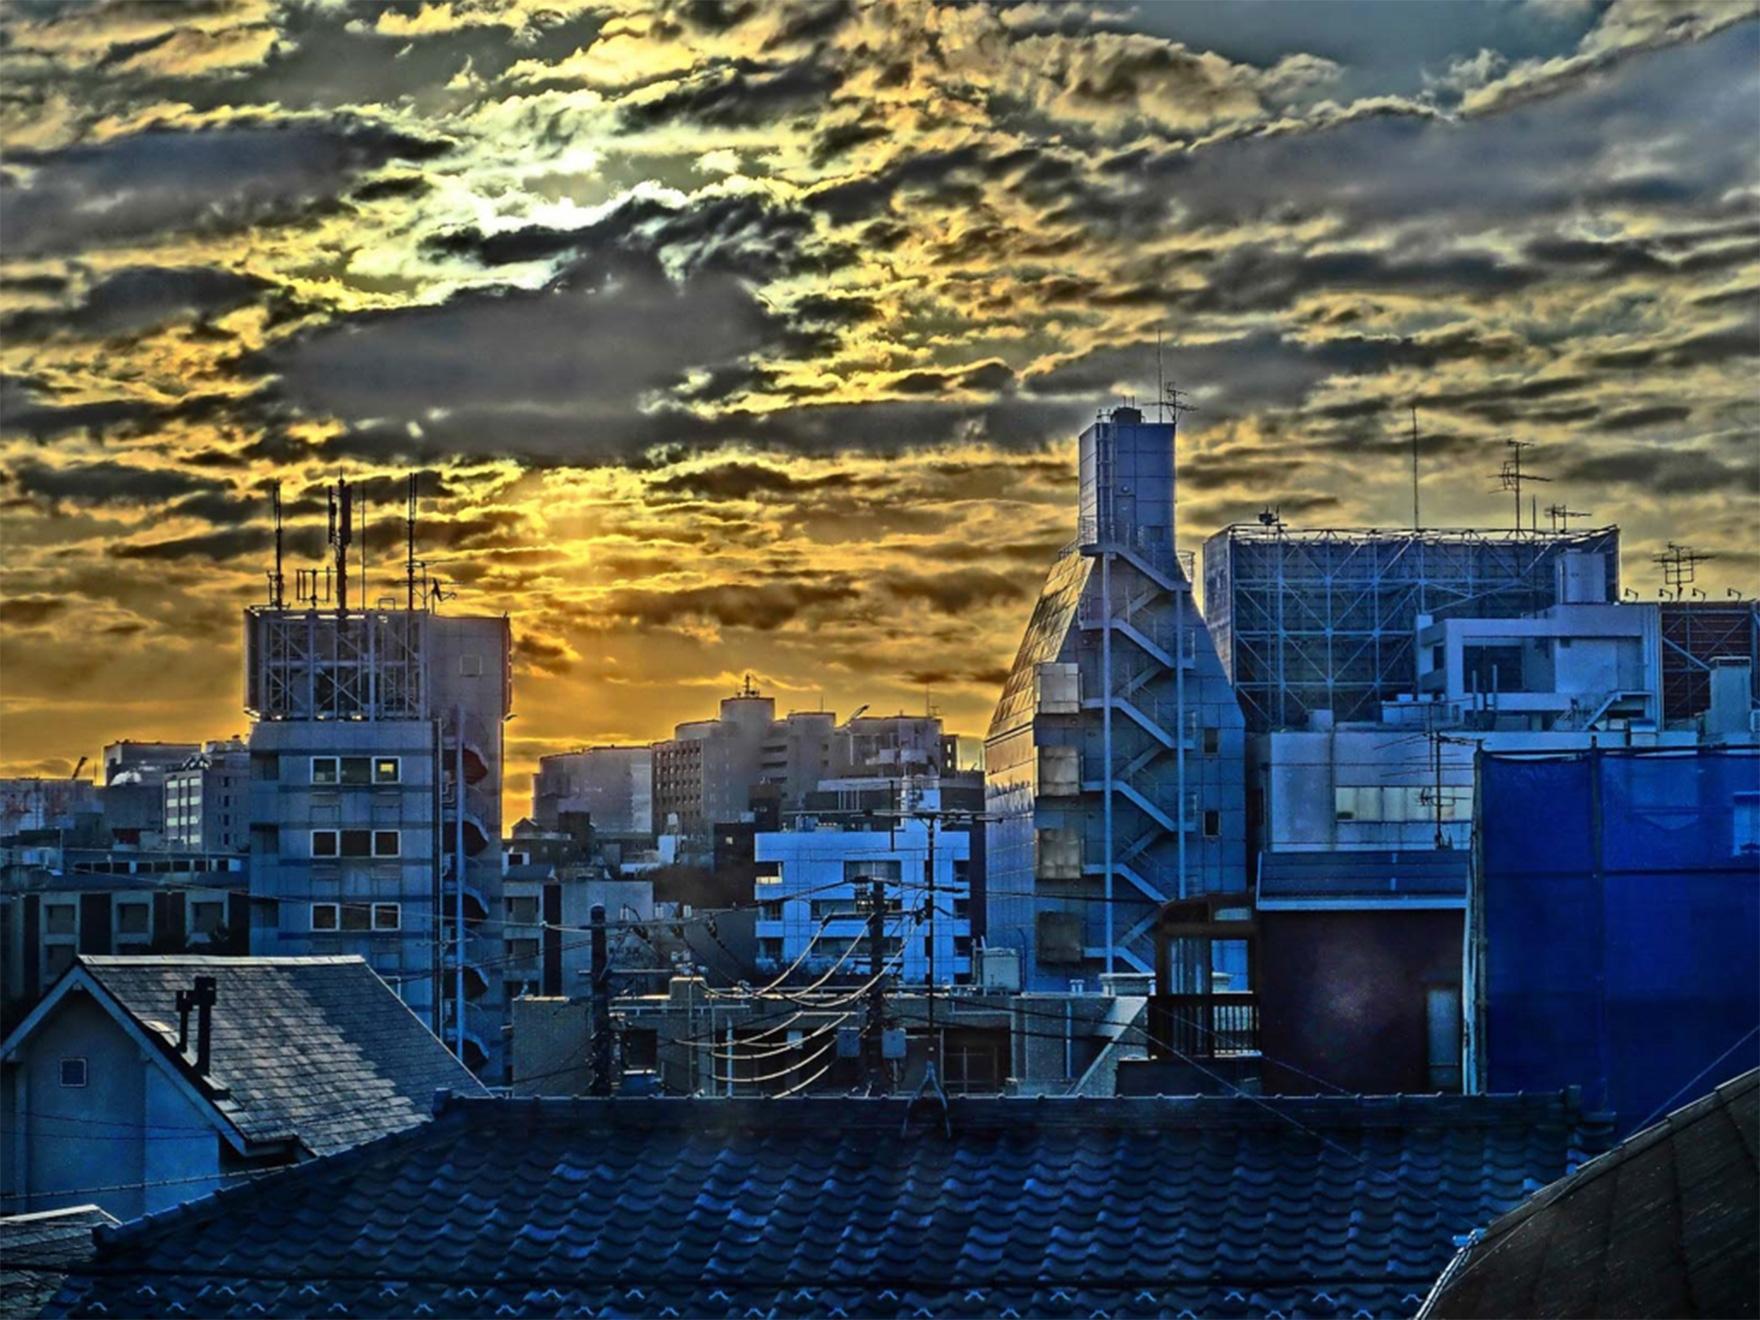 Kikuji Kawada, Morning Glow from the series 2011 Phenomena: Phenomena, Chaos, Clouds, Sun, Moon, 2011